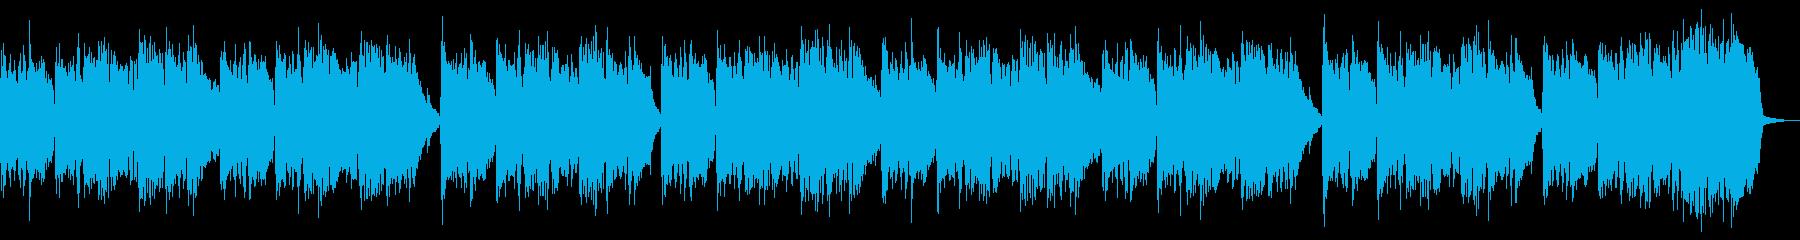 【CM】クールなエレクトロBGM・8の再生済みの波形